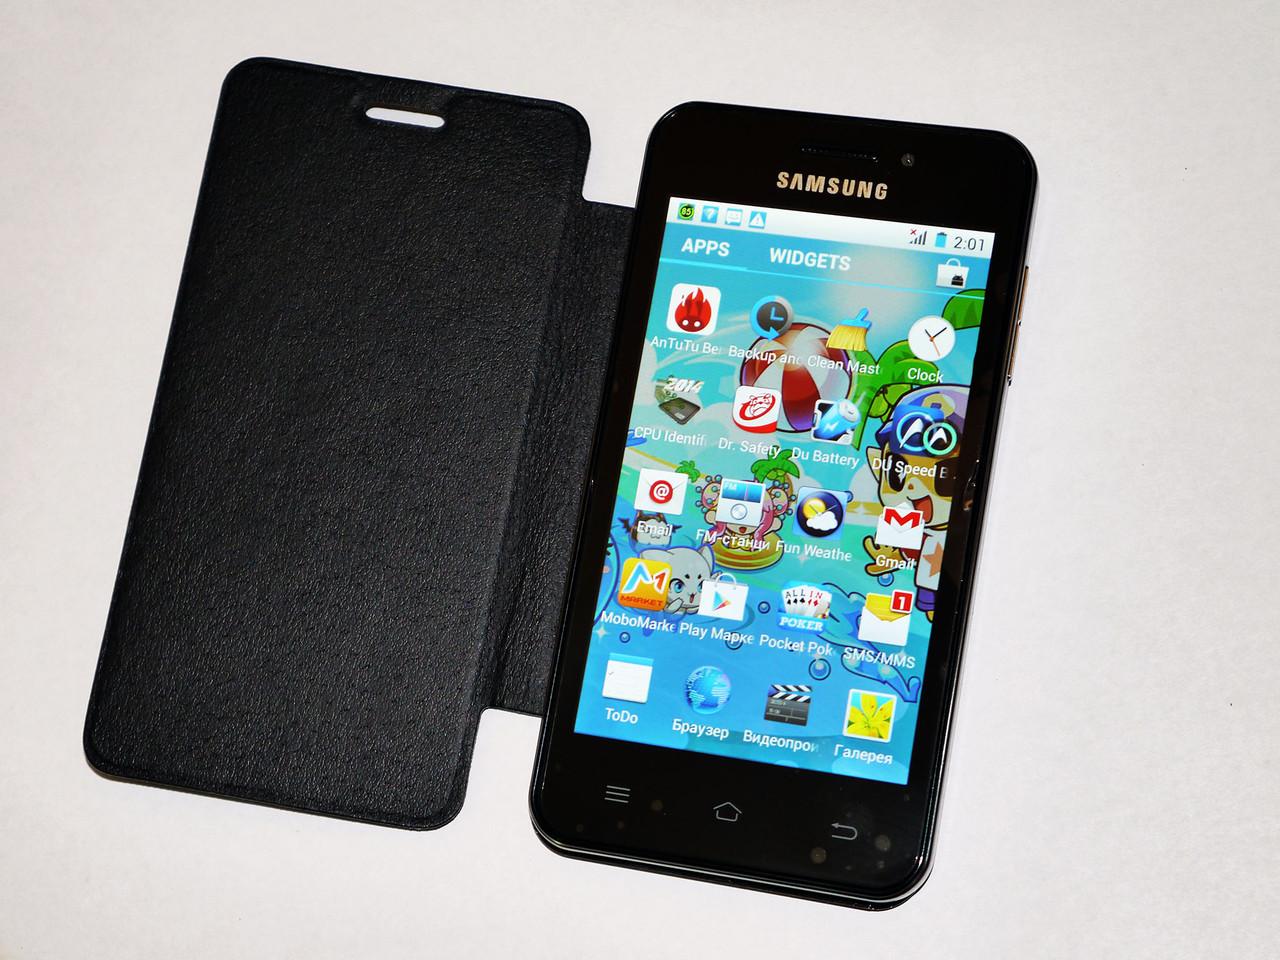 "Телефон Samsung HD888 экран 4.5"" 4 ядра, WiFi, 2 sim, Android 4.2.2, камера 5MP, Черный - Чехол в подарок!"